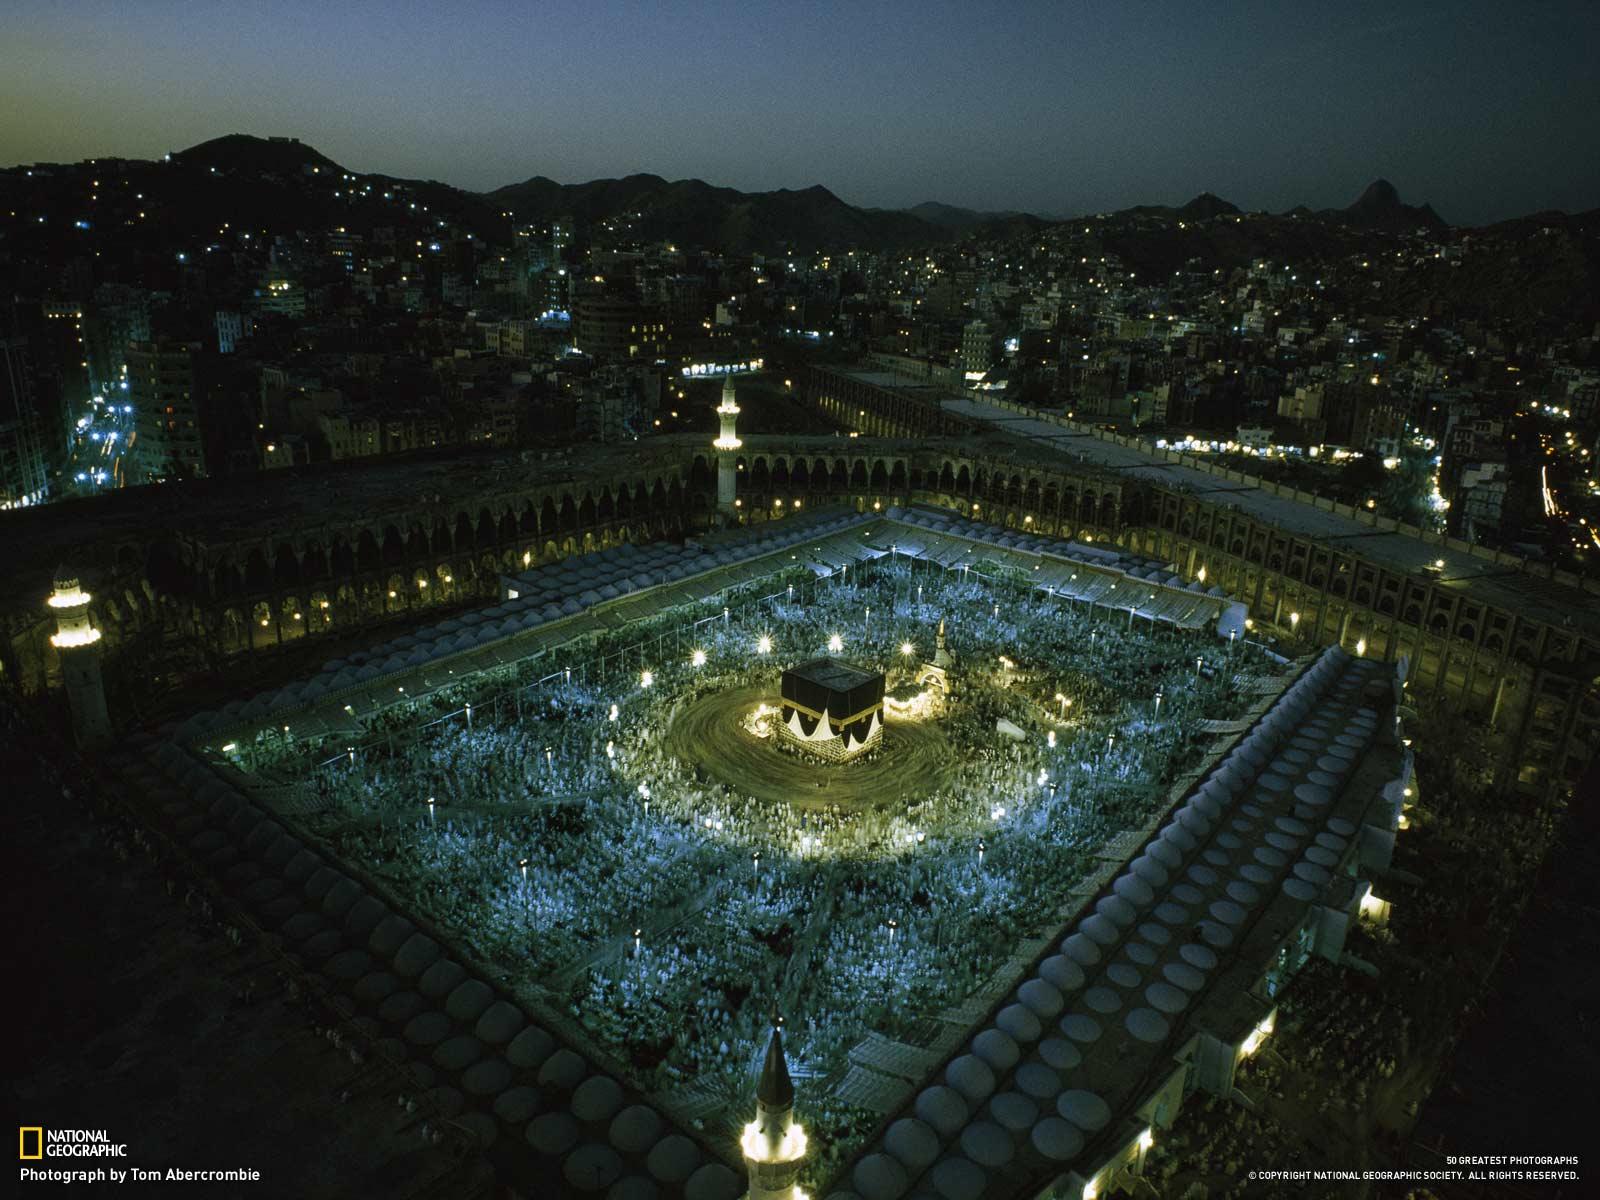 Mecca at Night during Haj, Saudi Arabia